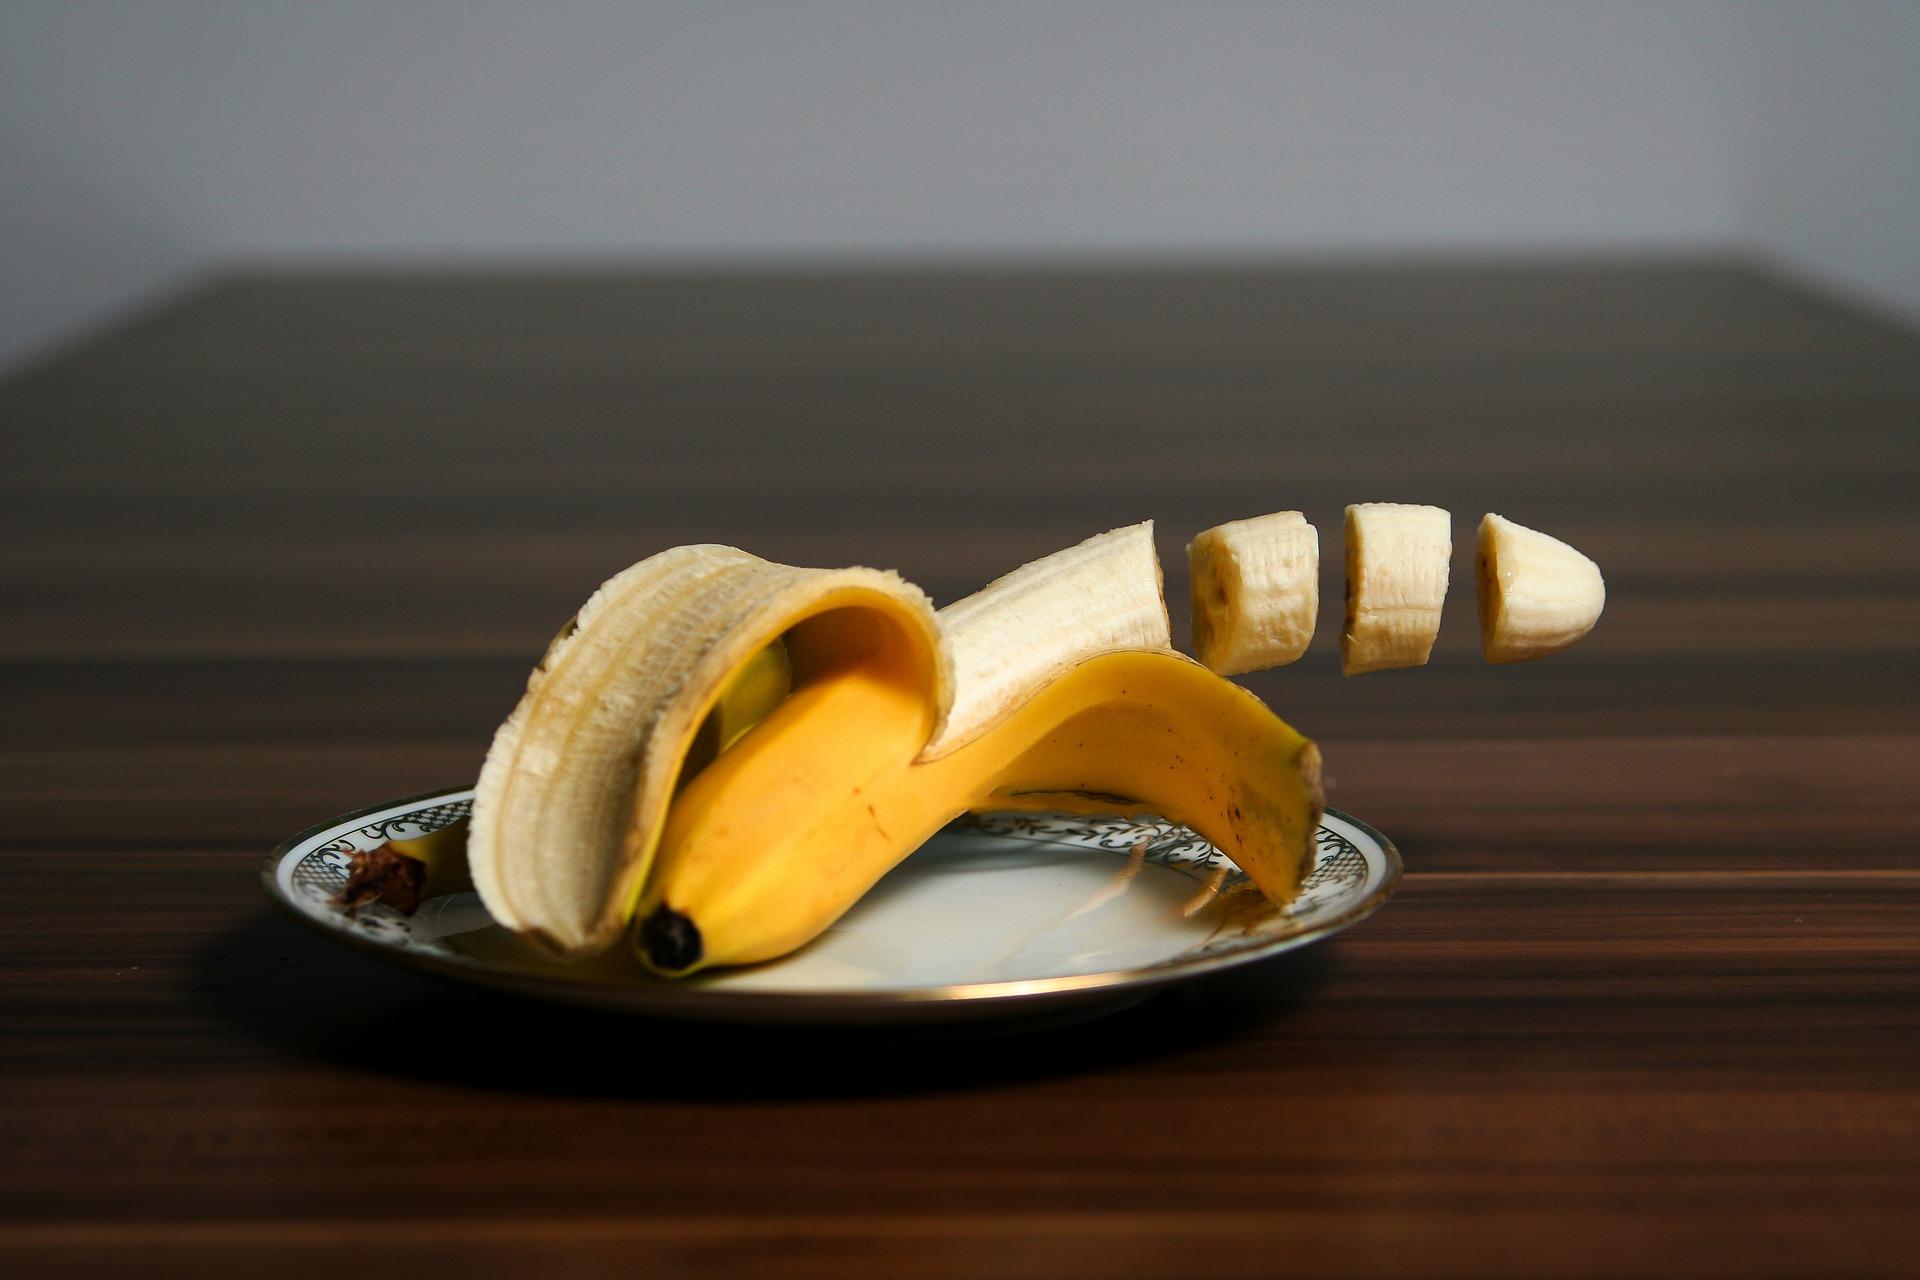 banana-344361_1920.jpg